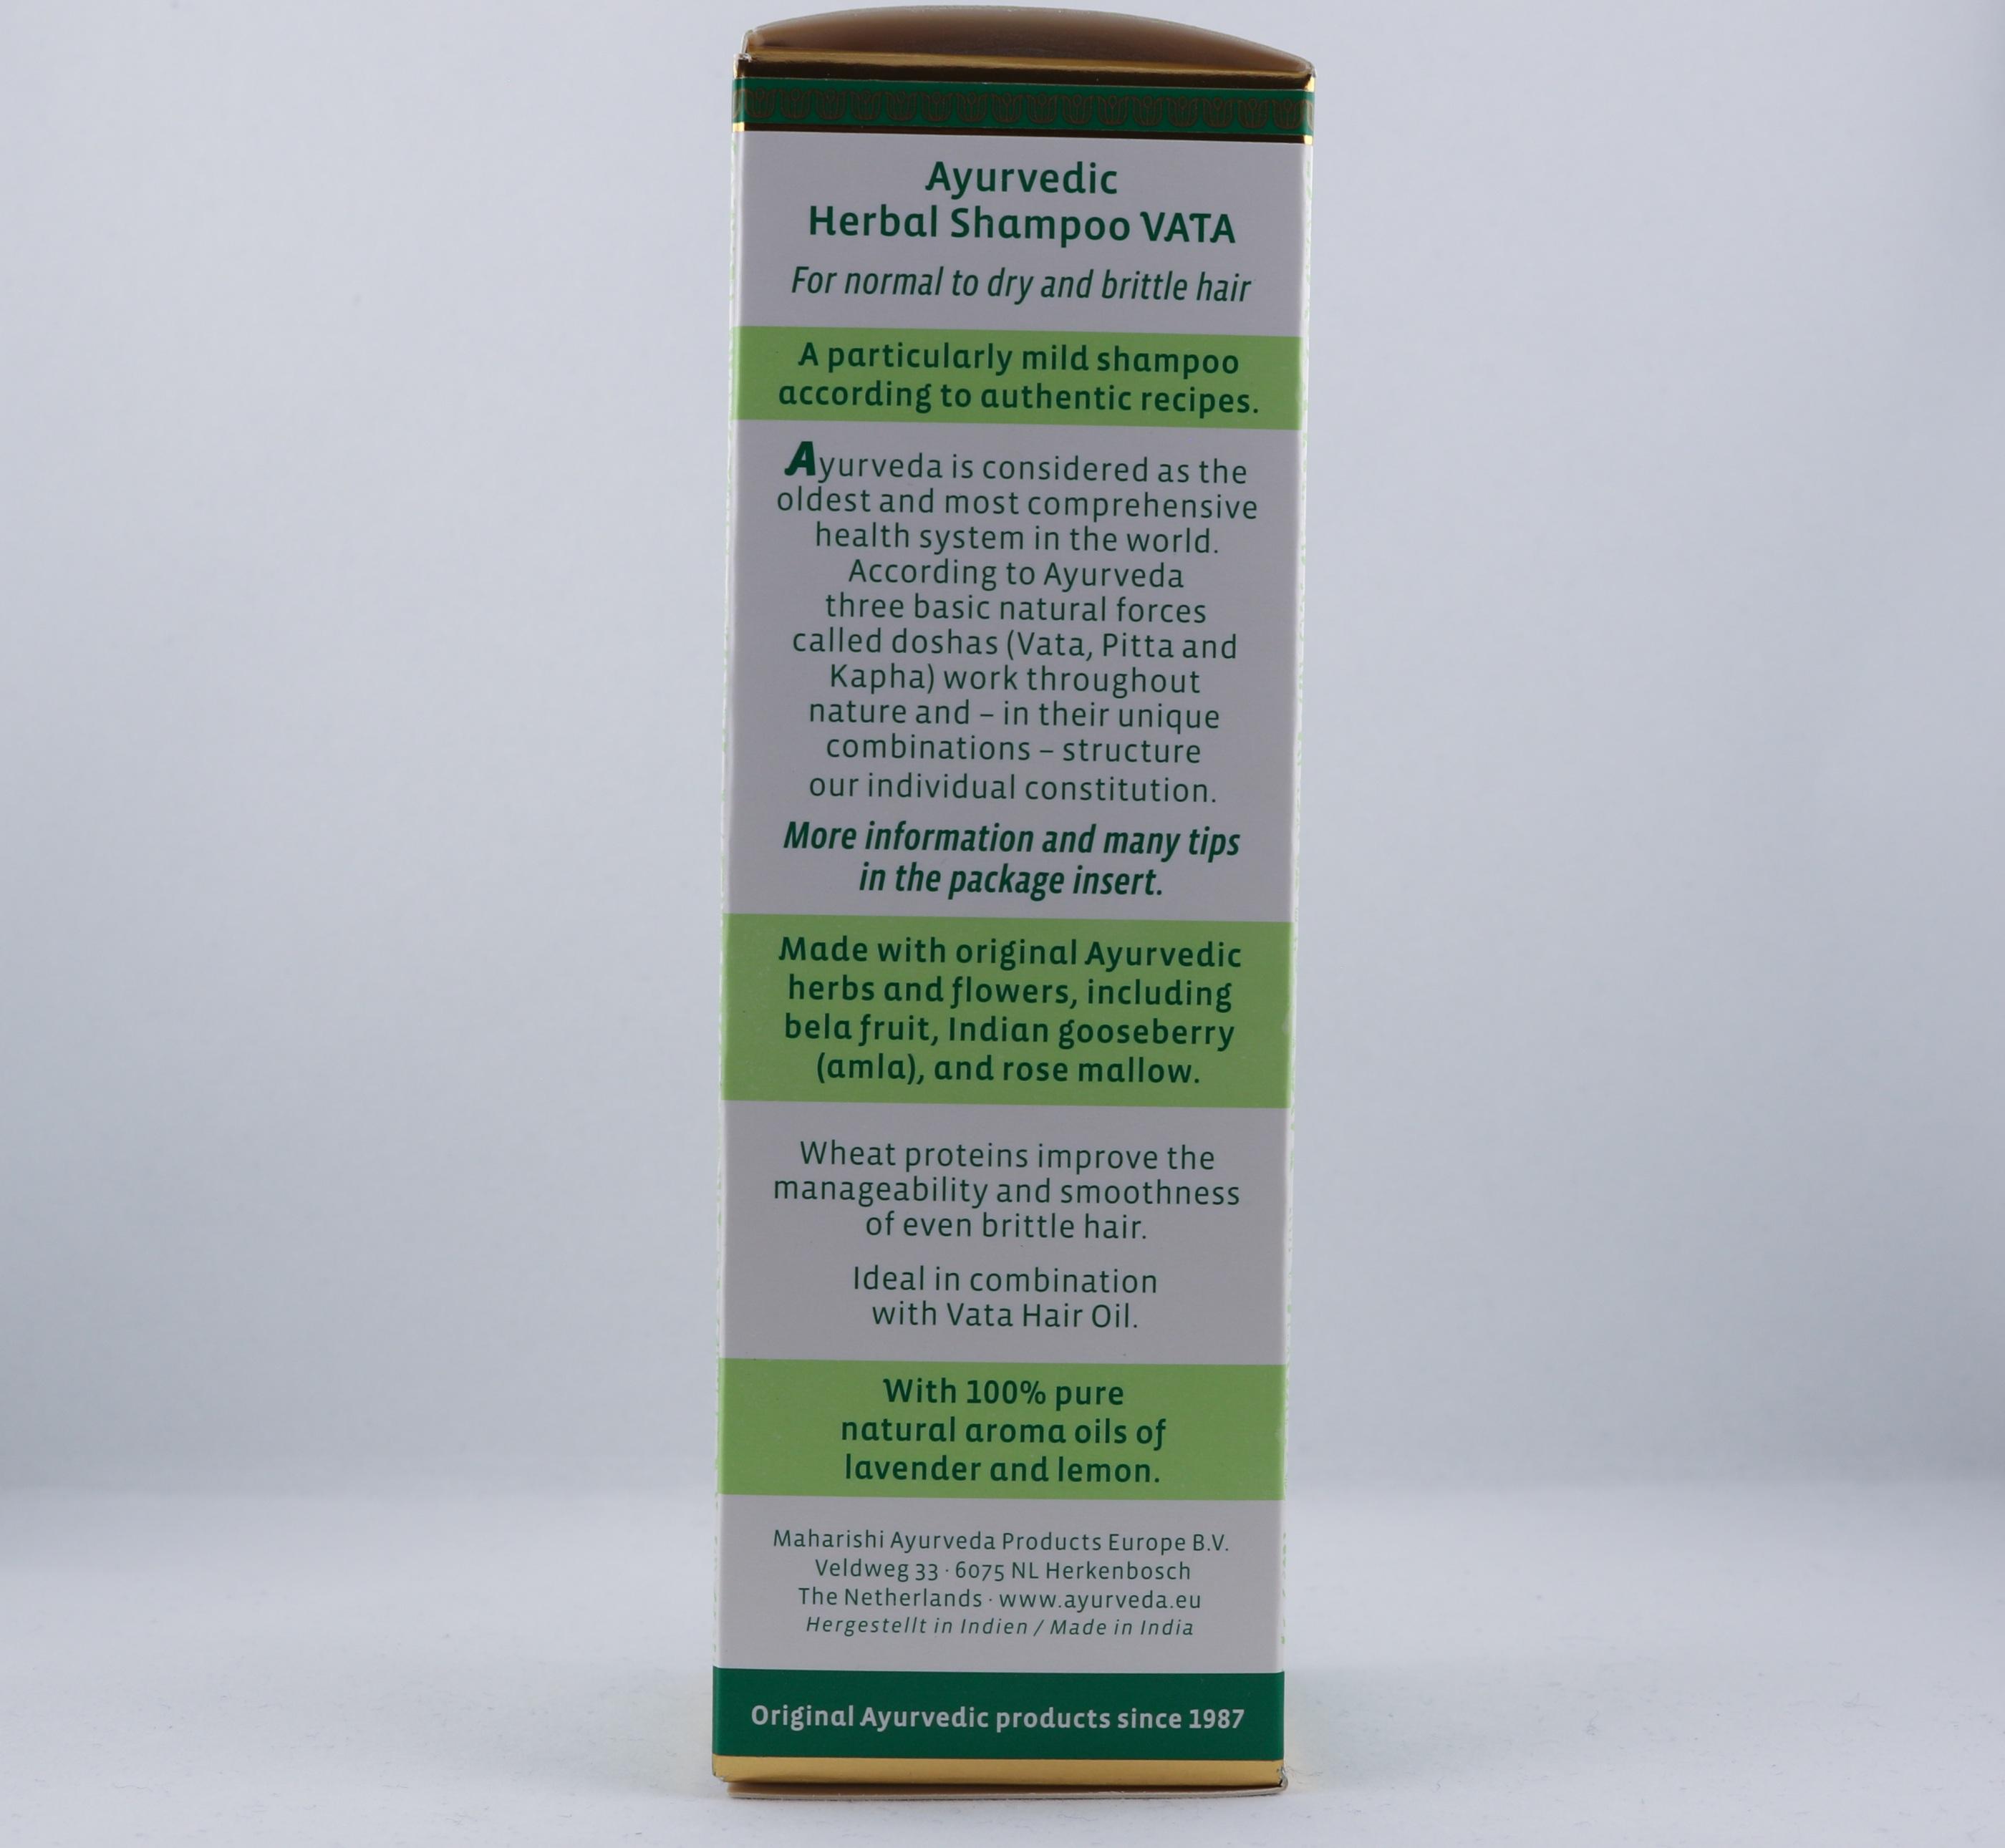 Vata schampo hygien hårtyper alternativ hälsa wellness ayurveda shampoo